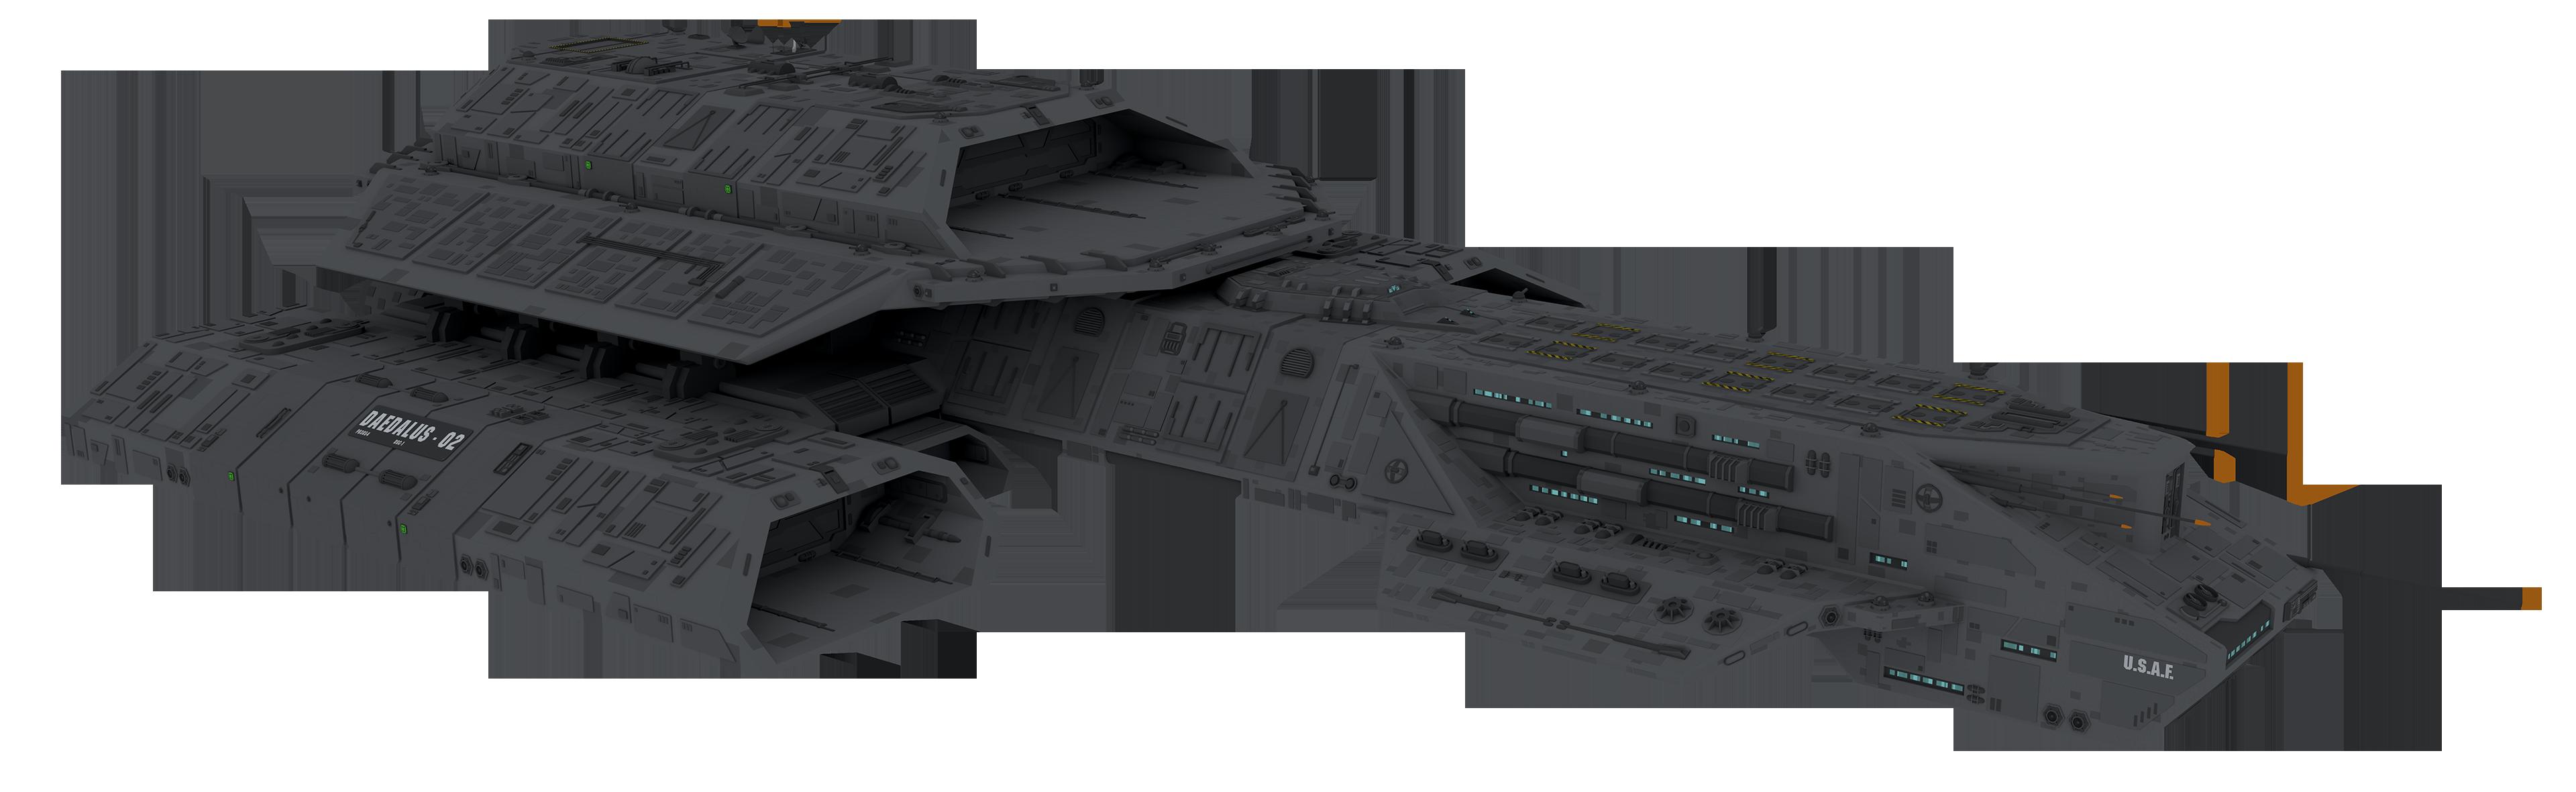 Uss Daedalus Stargate Expanded Universe Wiki Fandom